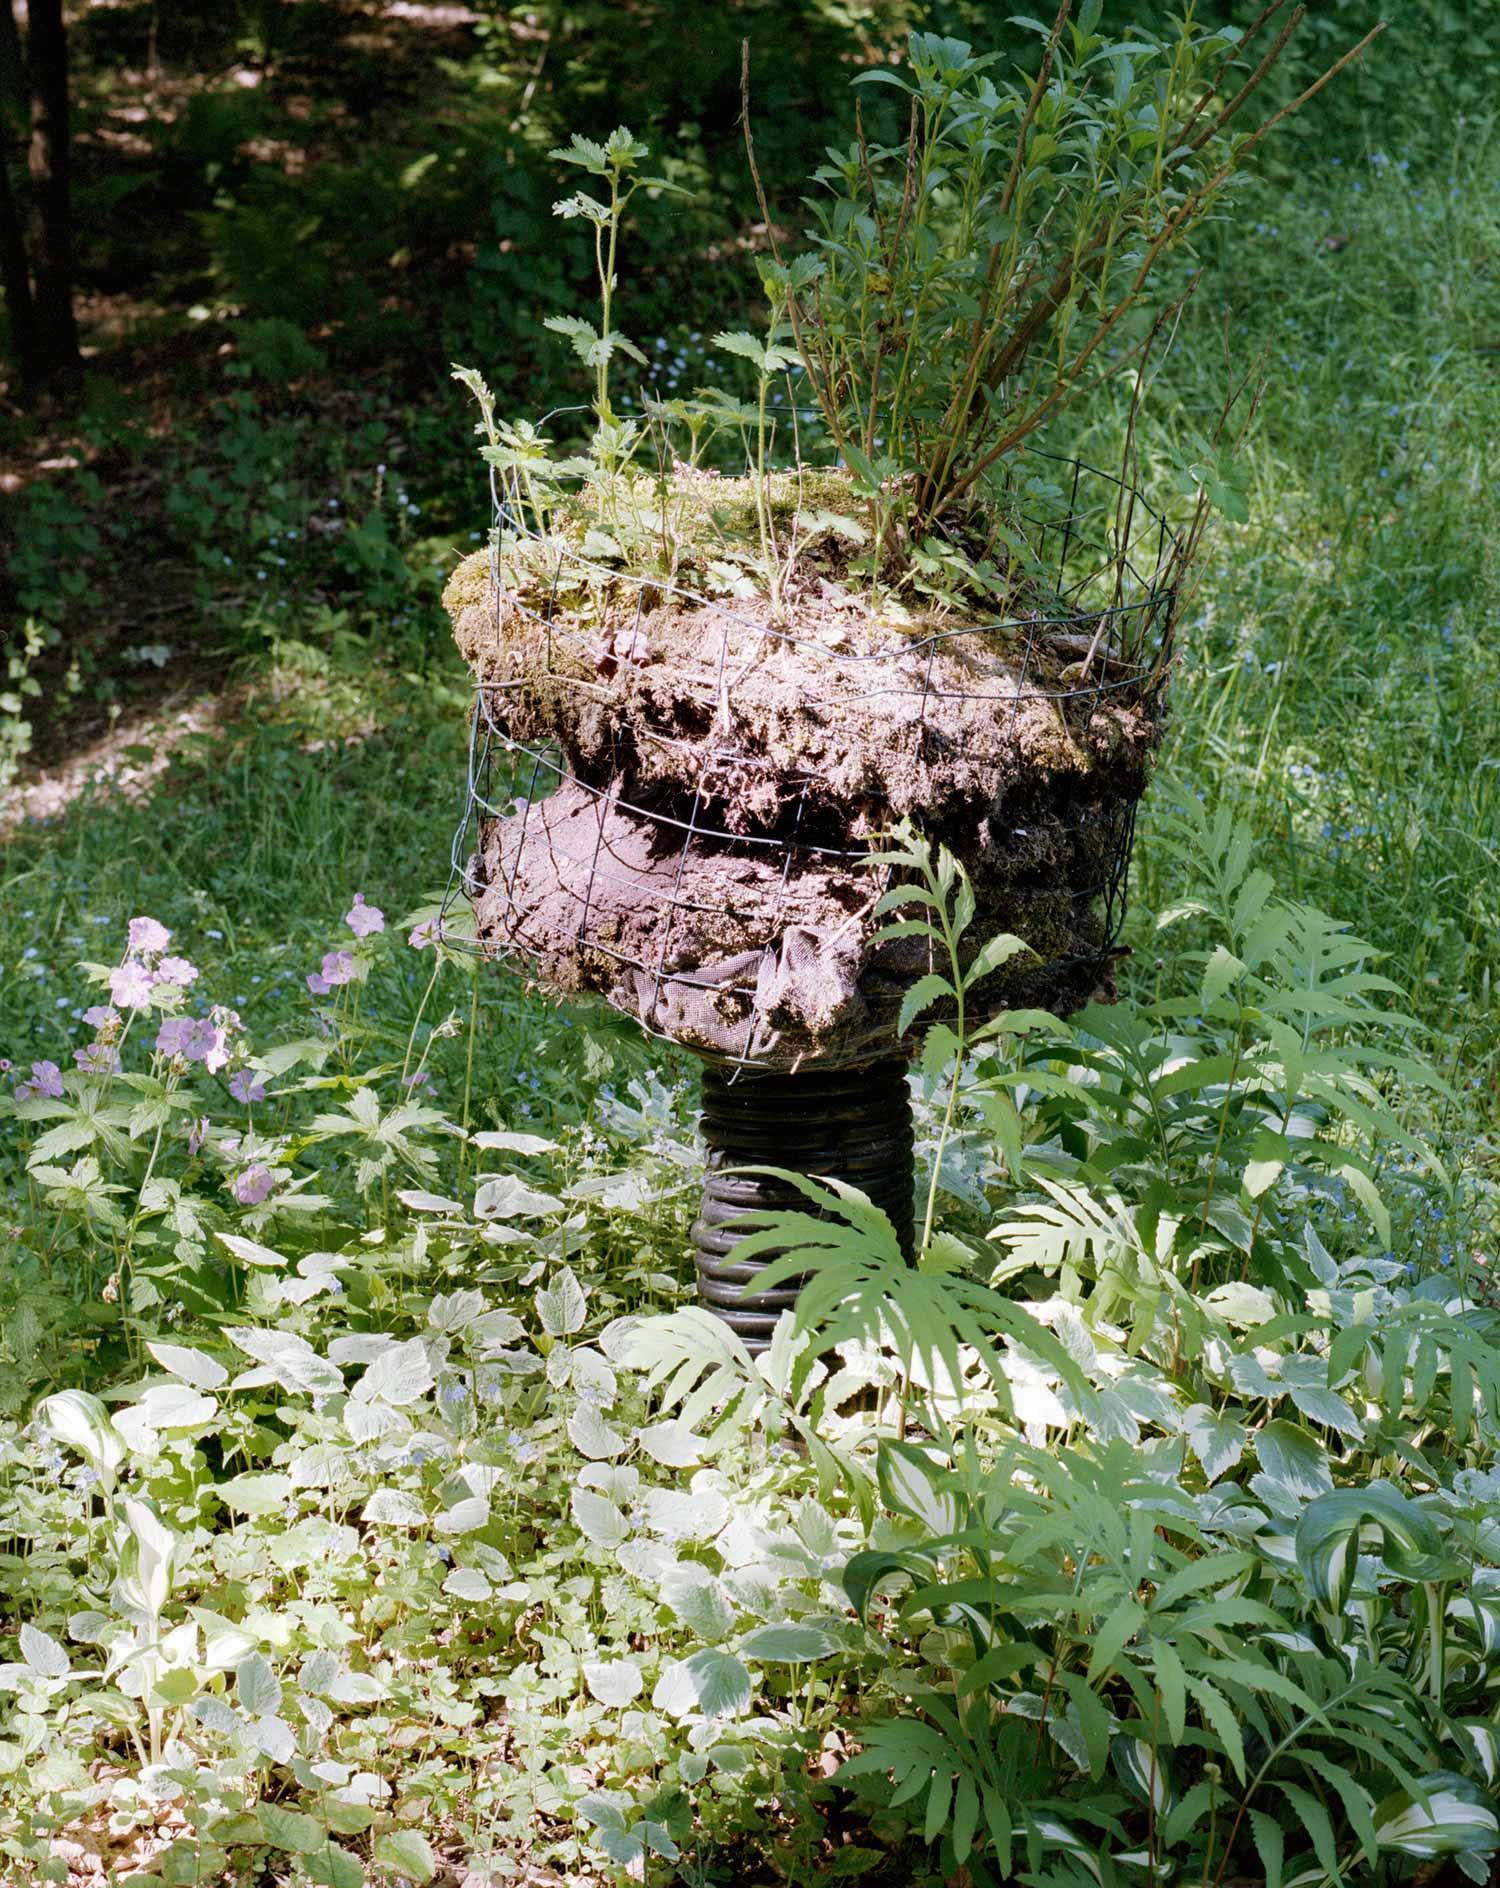 planter-web-1500.jpg